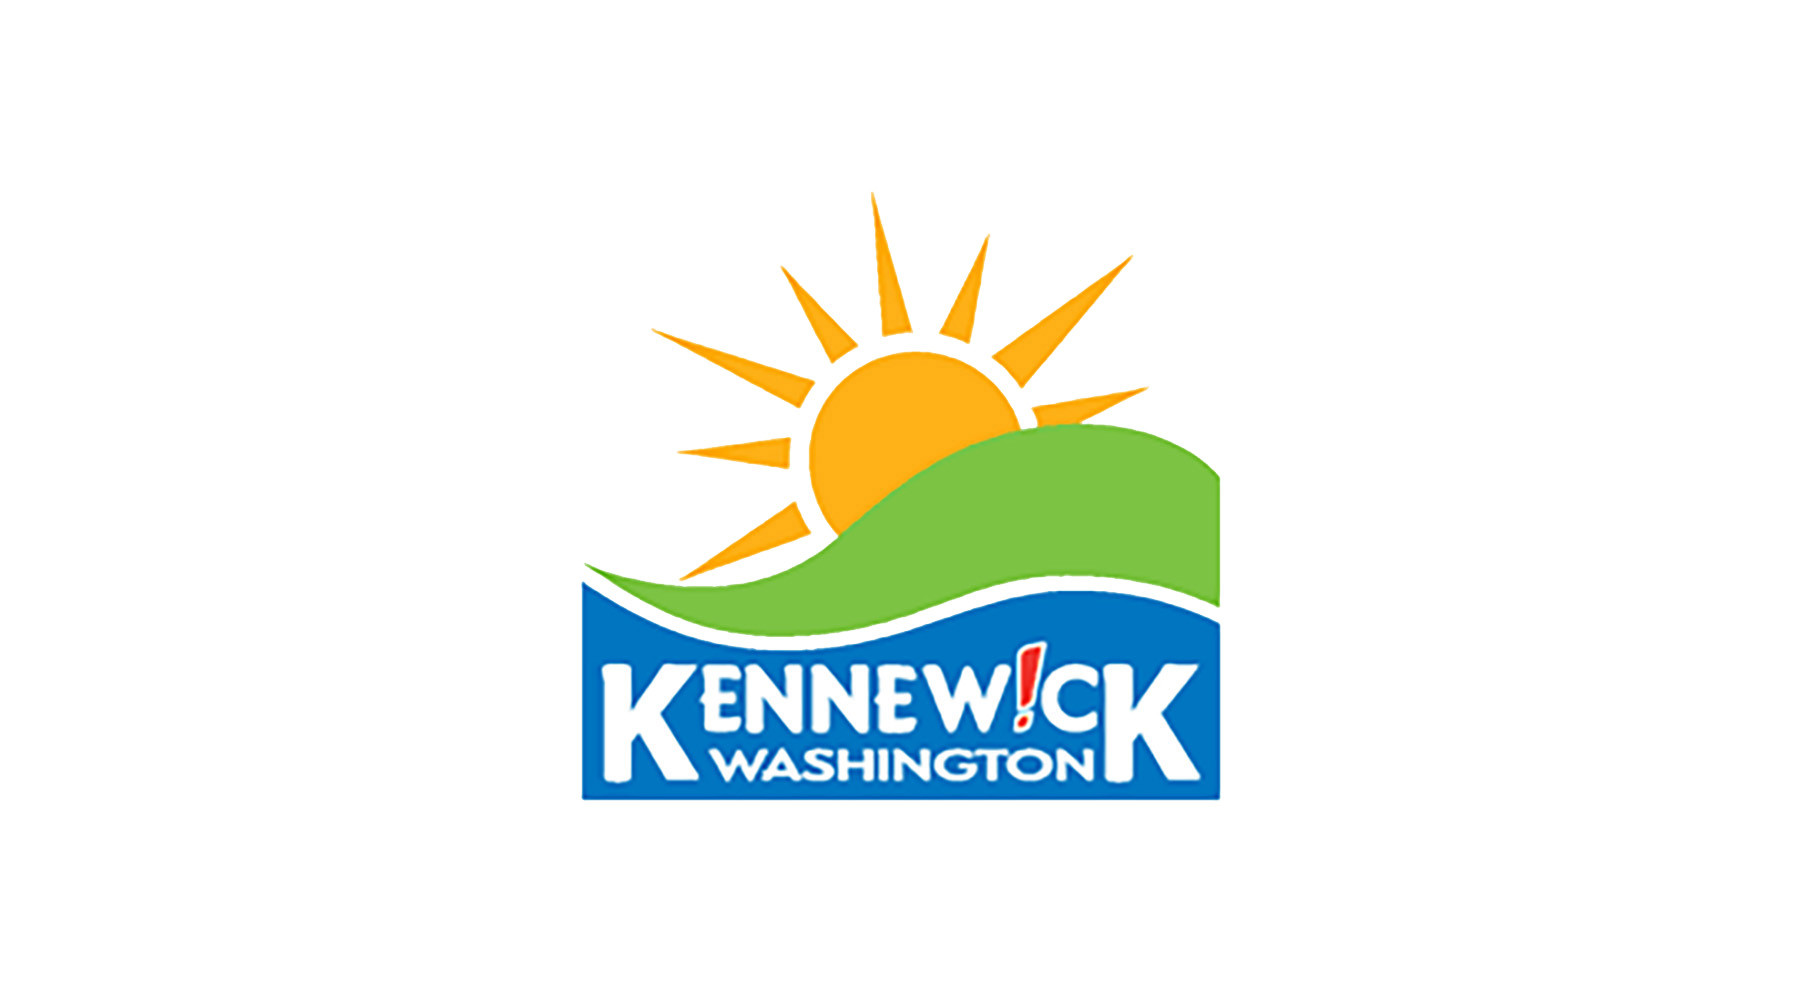 City of Kennewick 300dpi.jpg